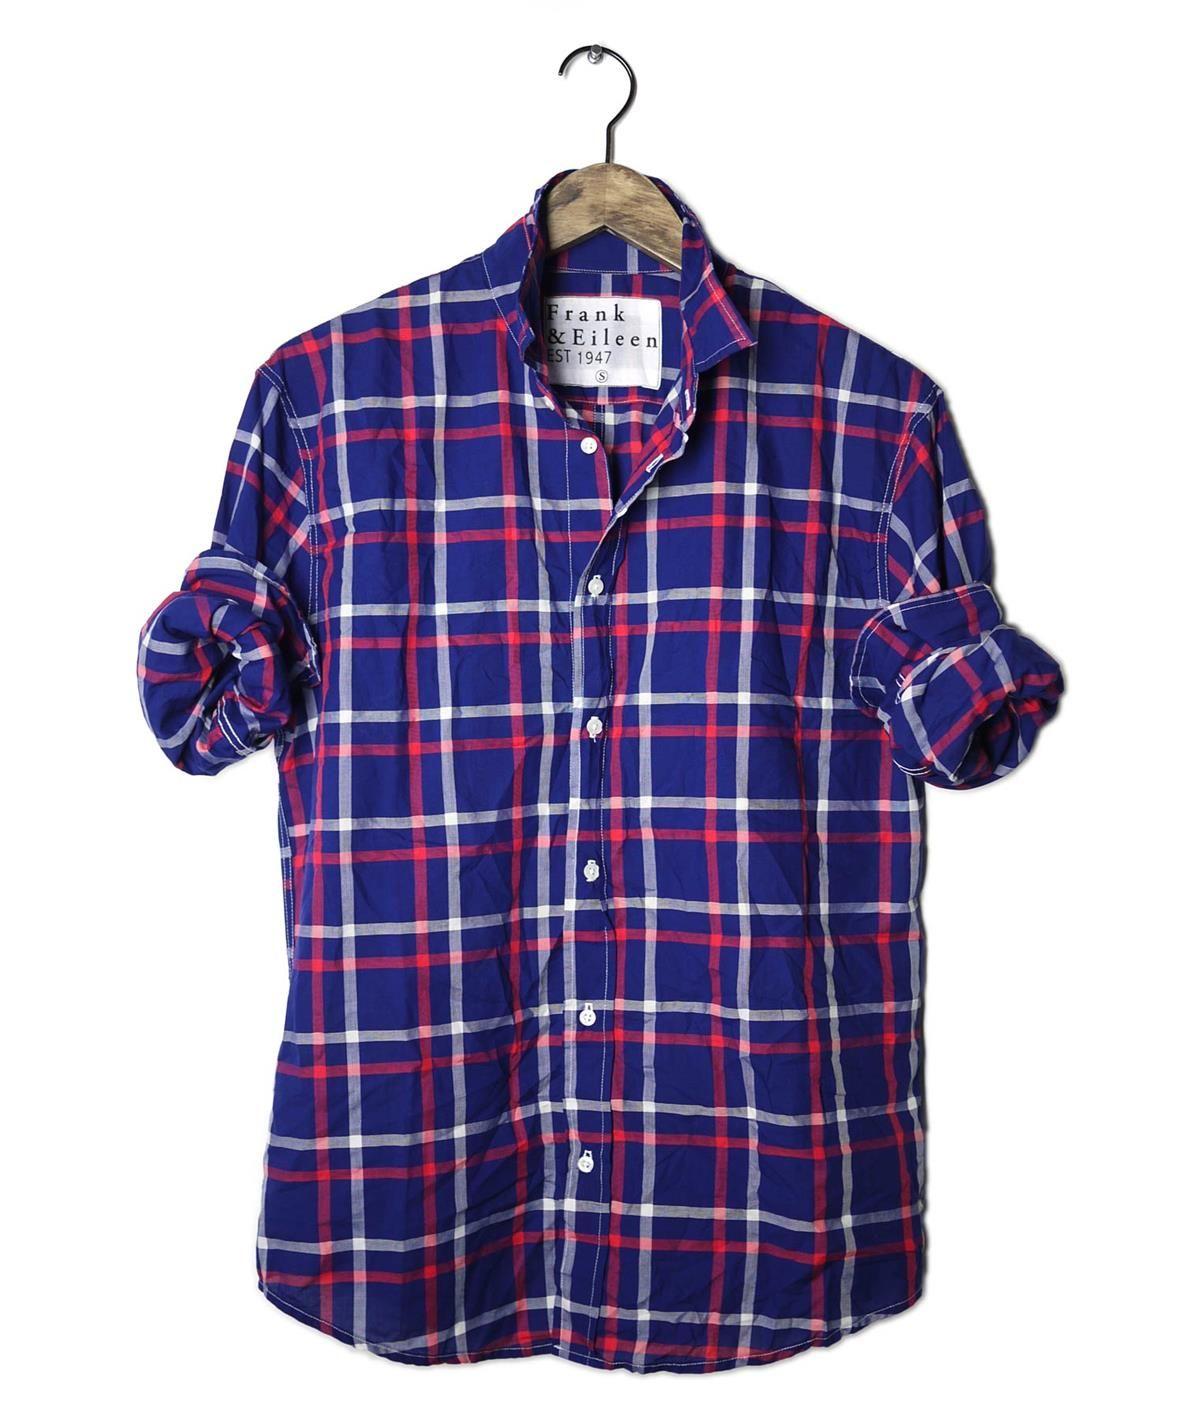 fa6fb2e4 Red, white and blue check shirt | Marvellous.Male.Fashion | Mens ...